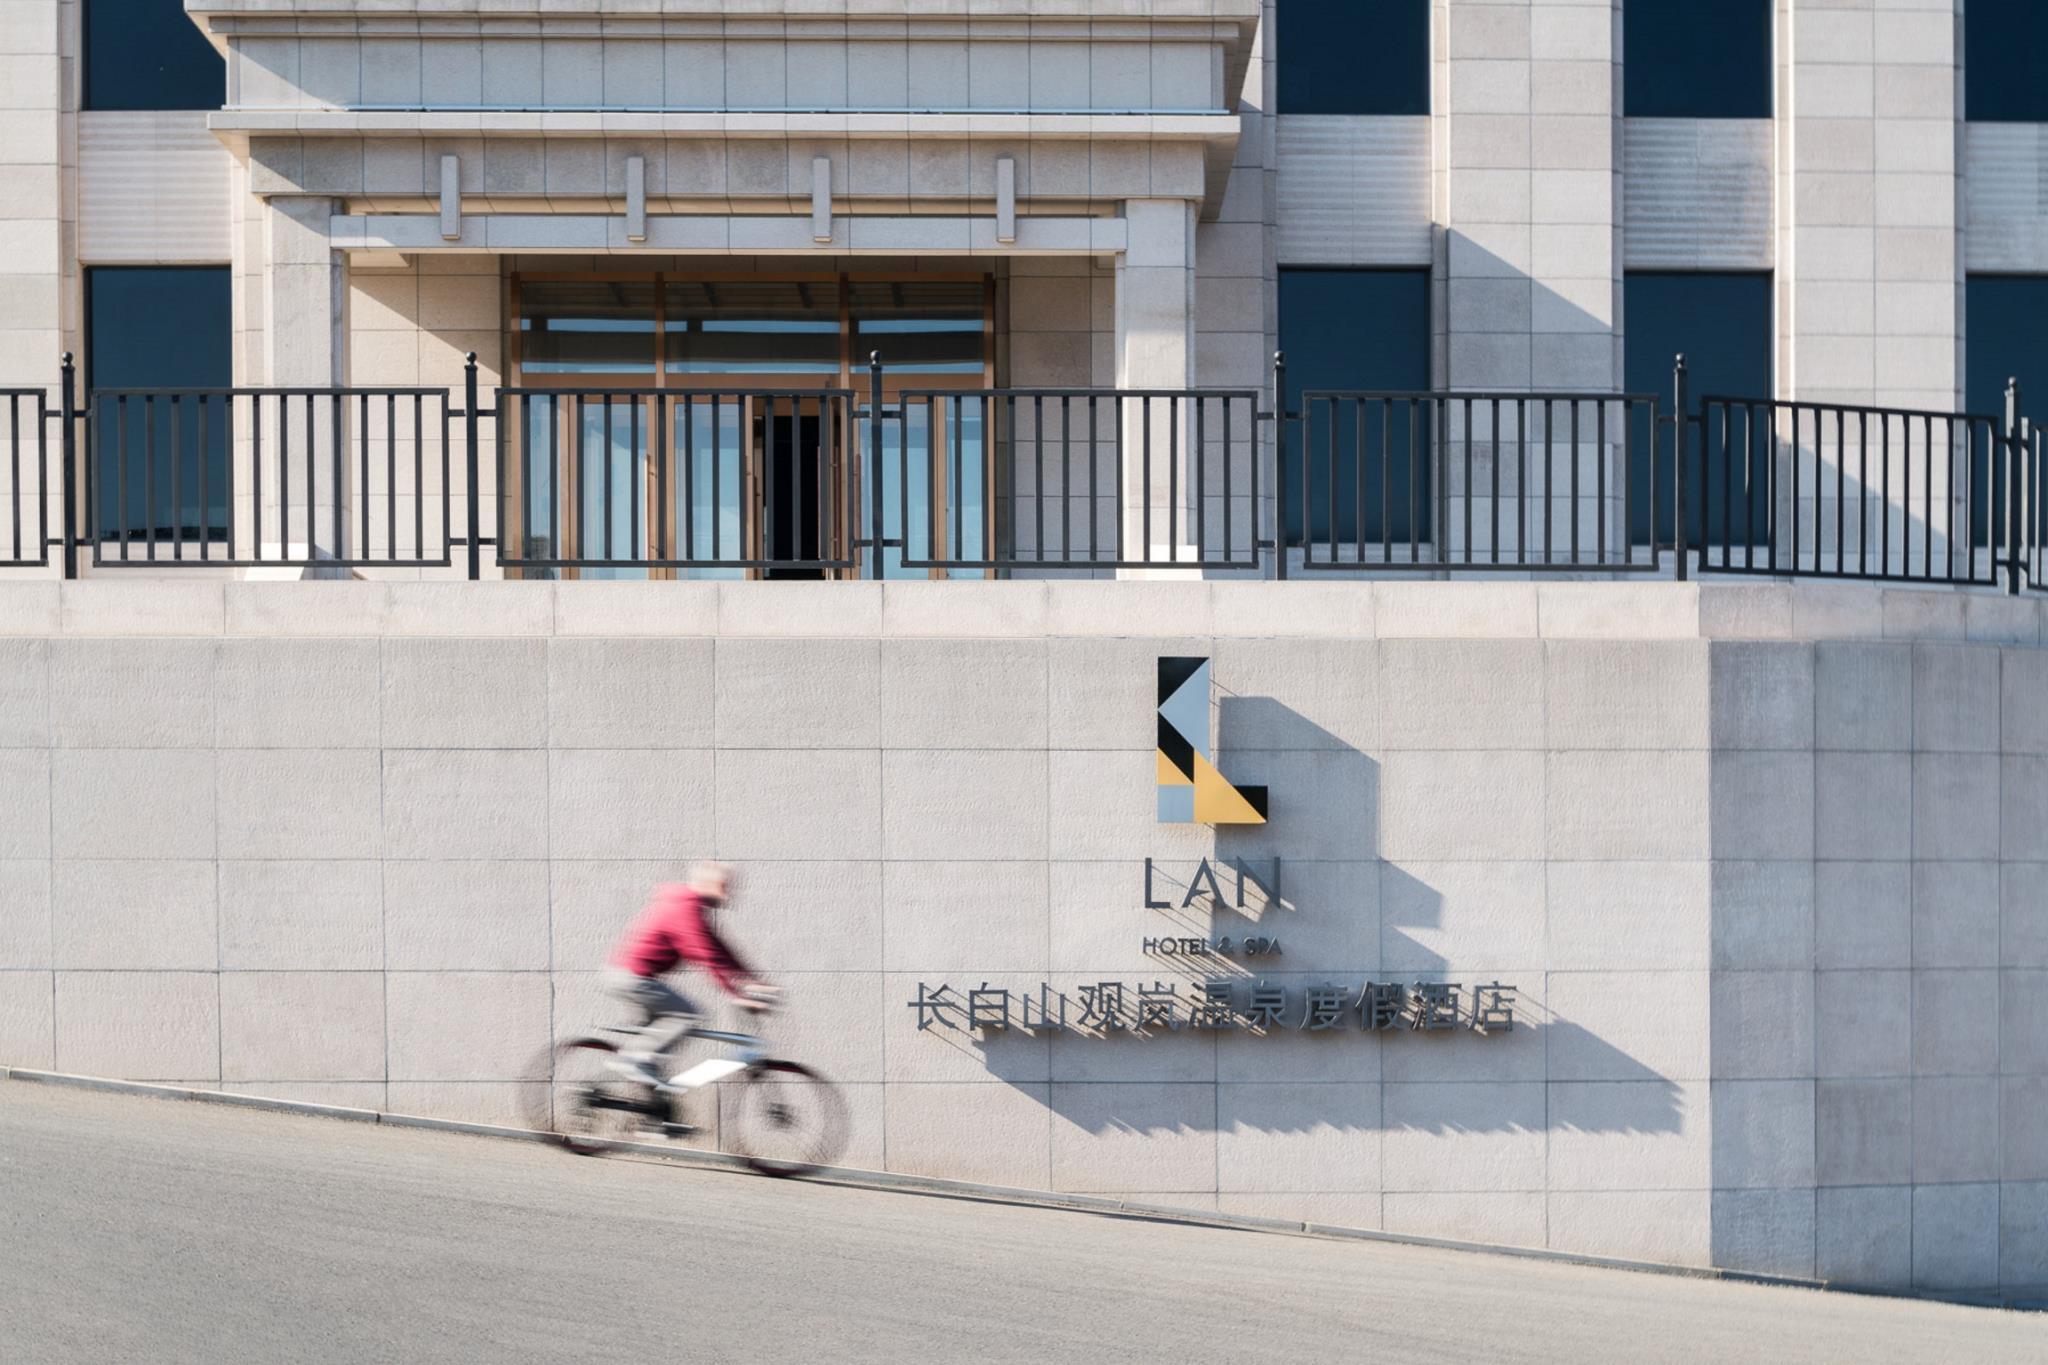 Lan Hotel and Spa ChangBaiShan, Baishan